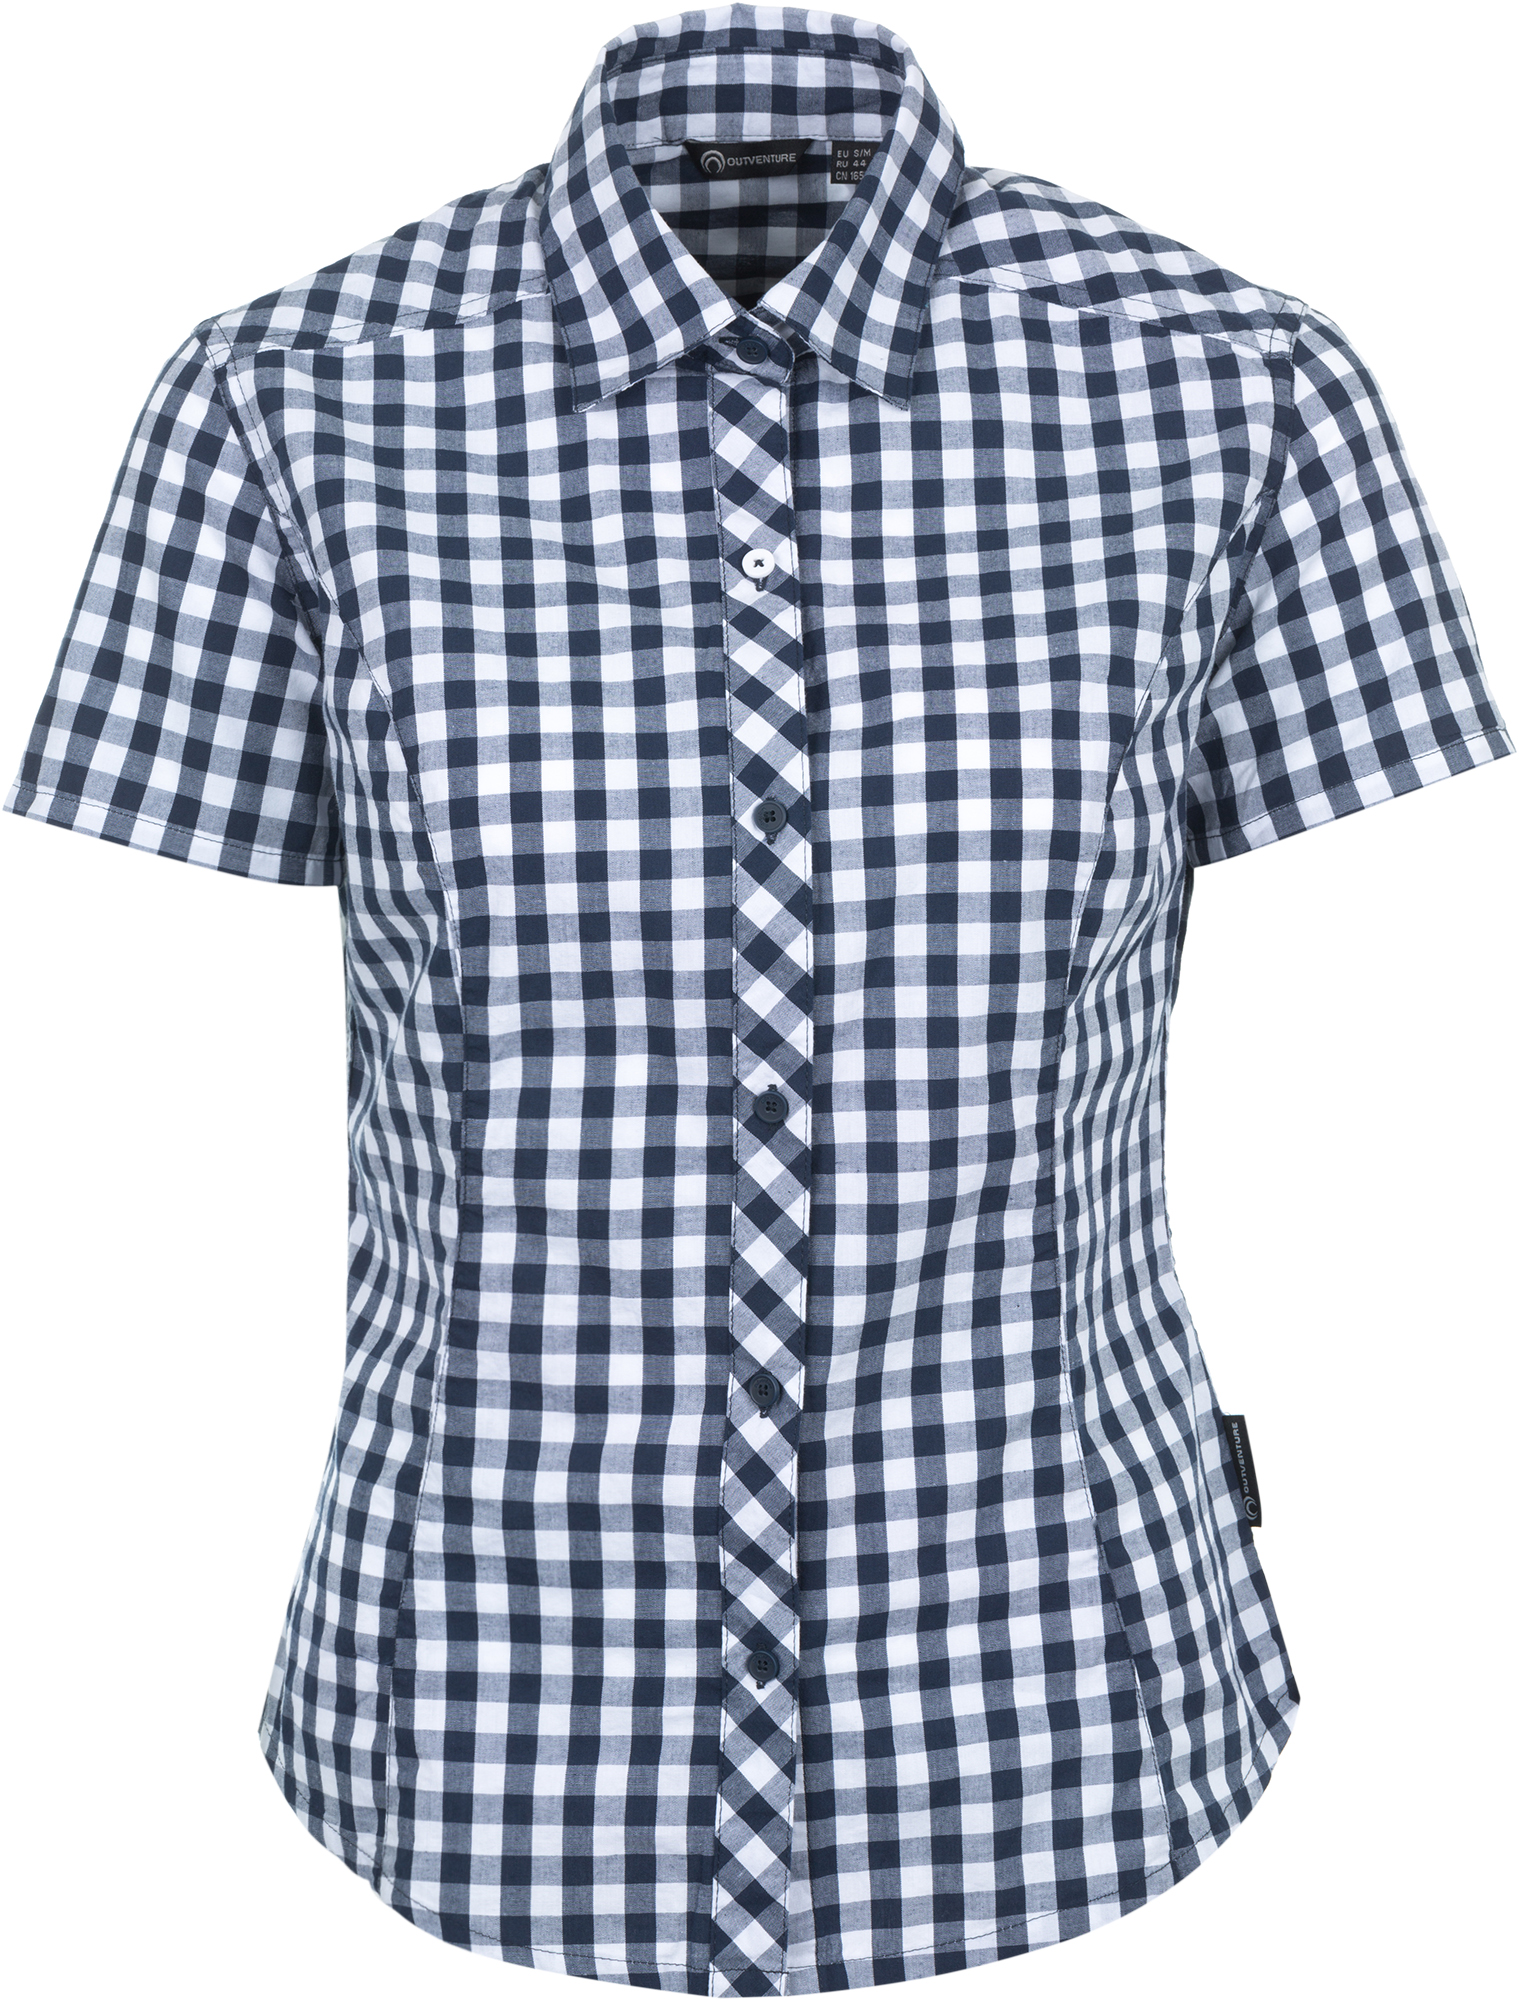 Outventure Рубашка женская Outventure, размер 56